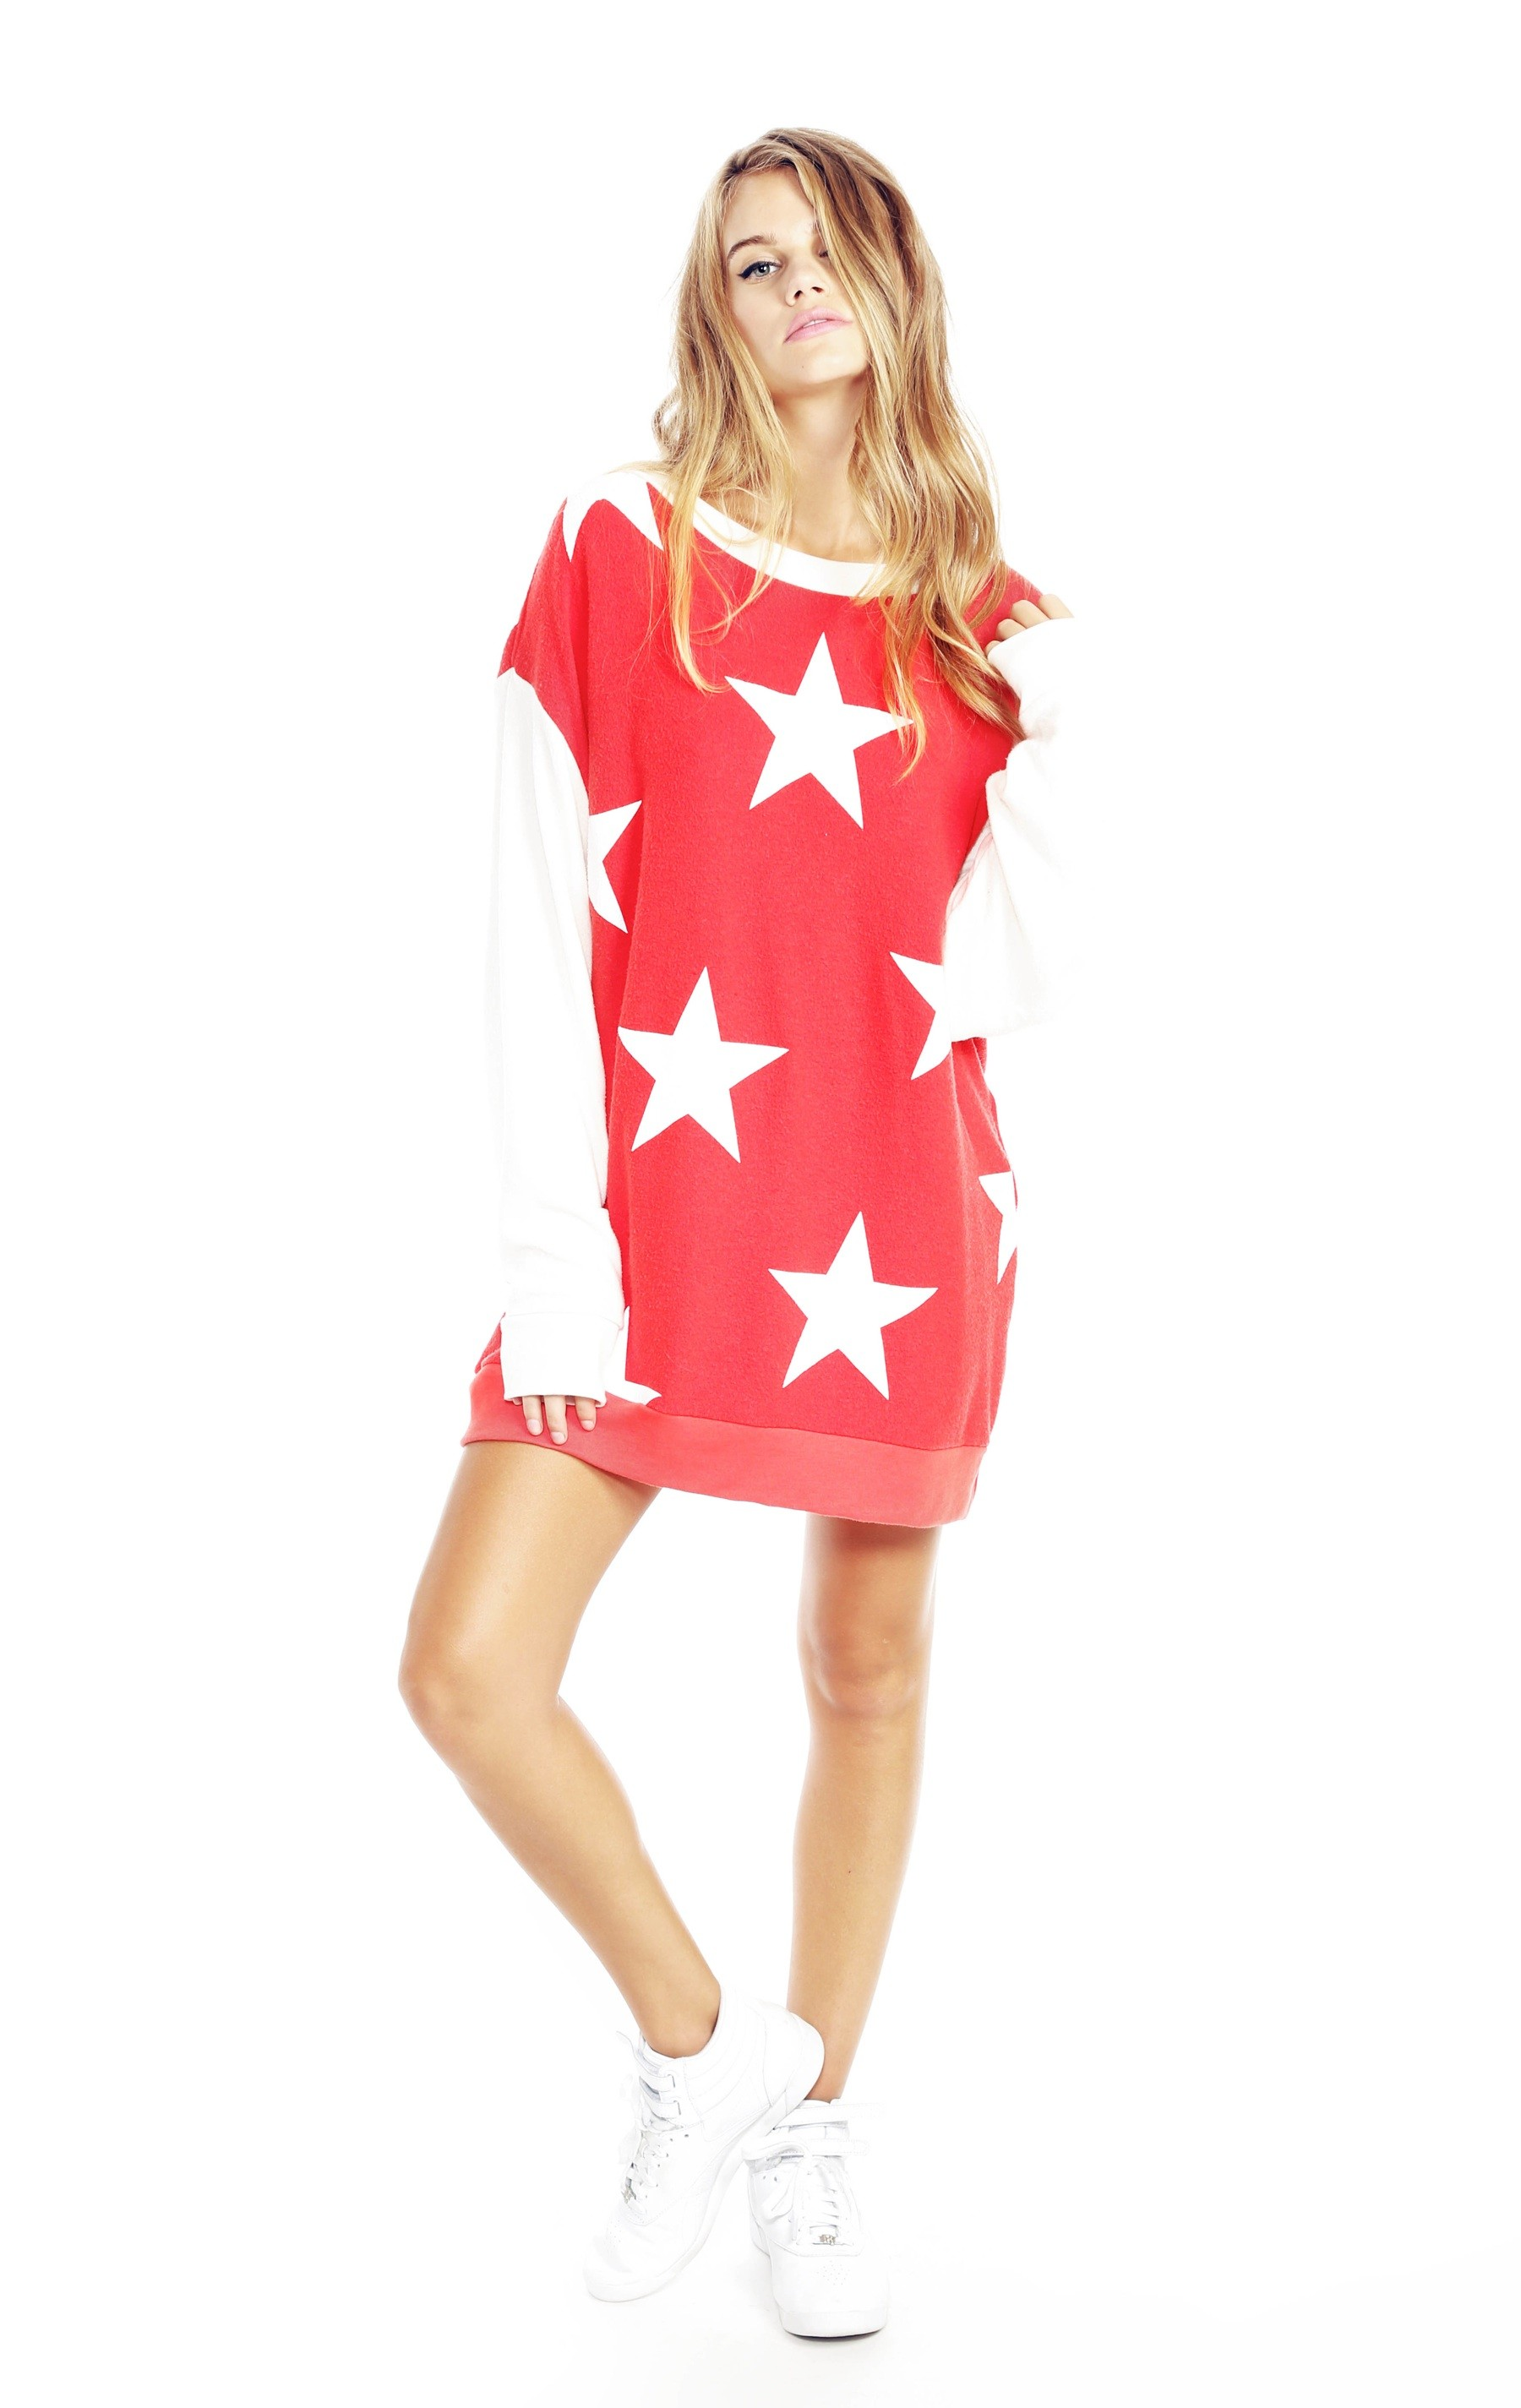 Starshine roadtrip sweater dress